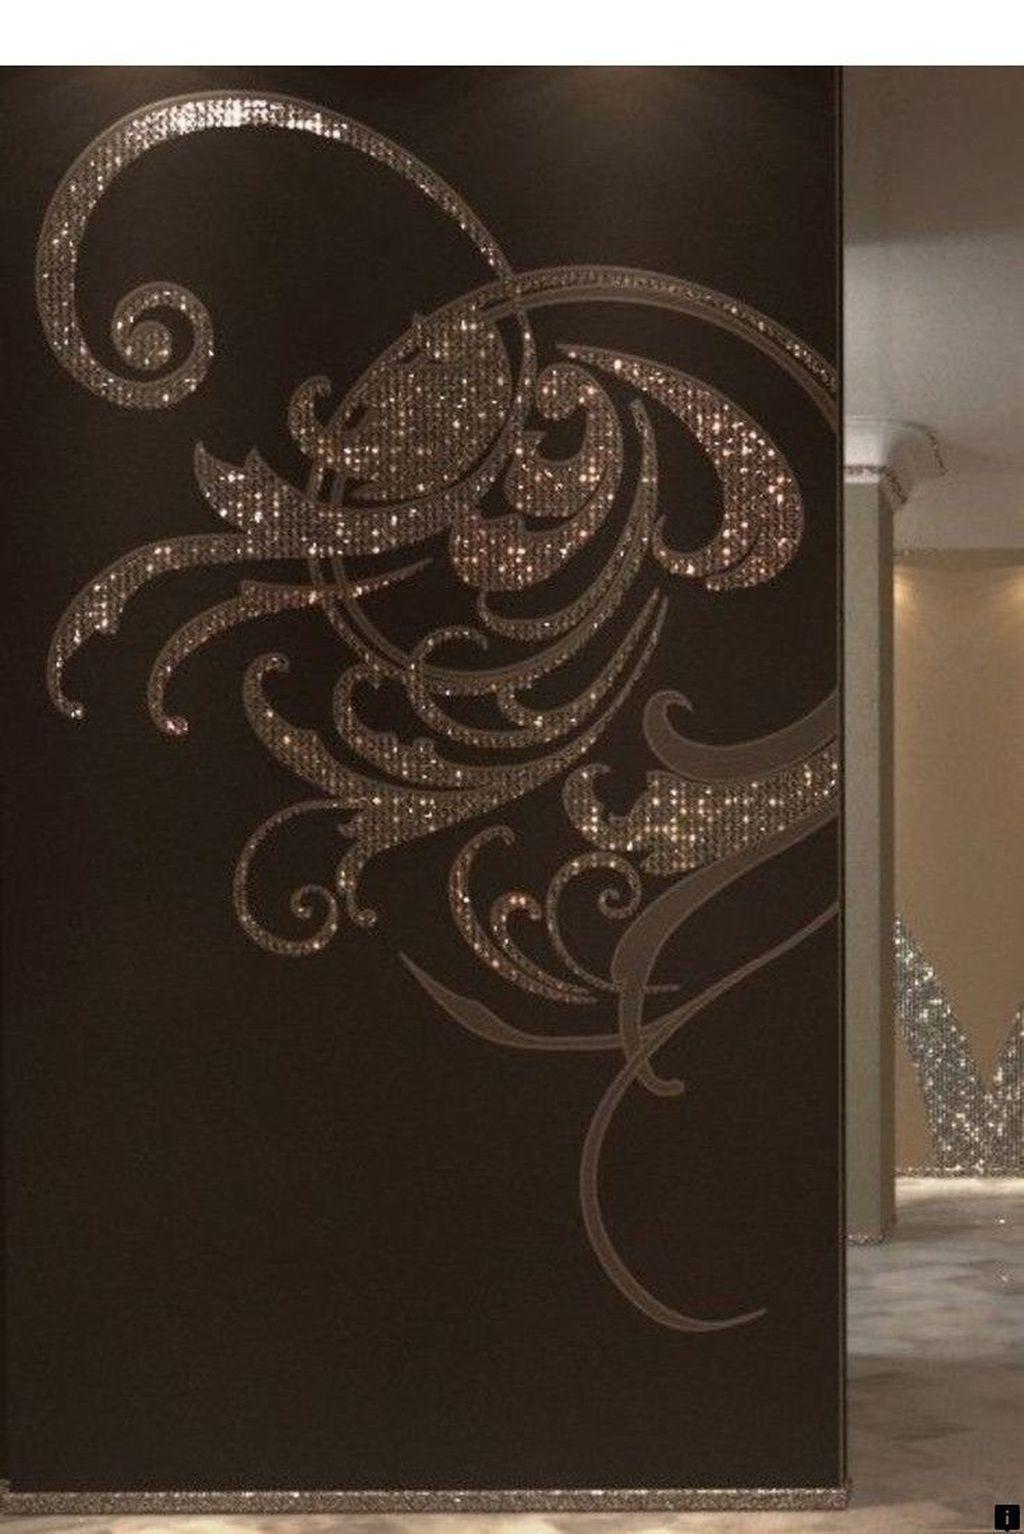 Vintage Glitter Wall Paint Design Ideas For Your Room11 Vintage Glitter Wall Paint Design Ideas For Your Room11 uncategorized